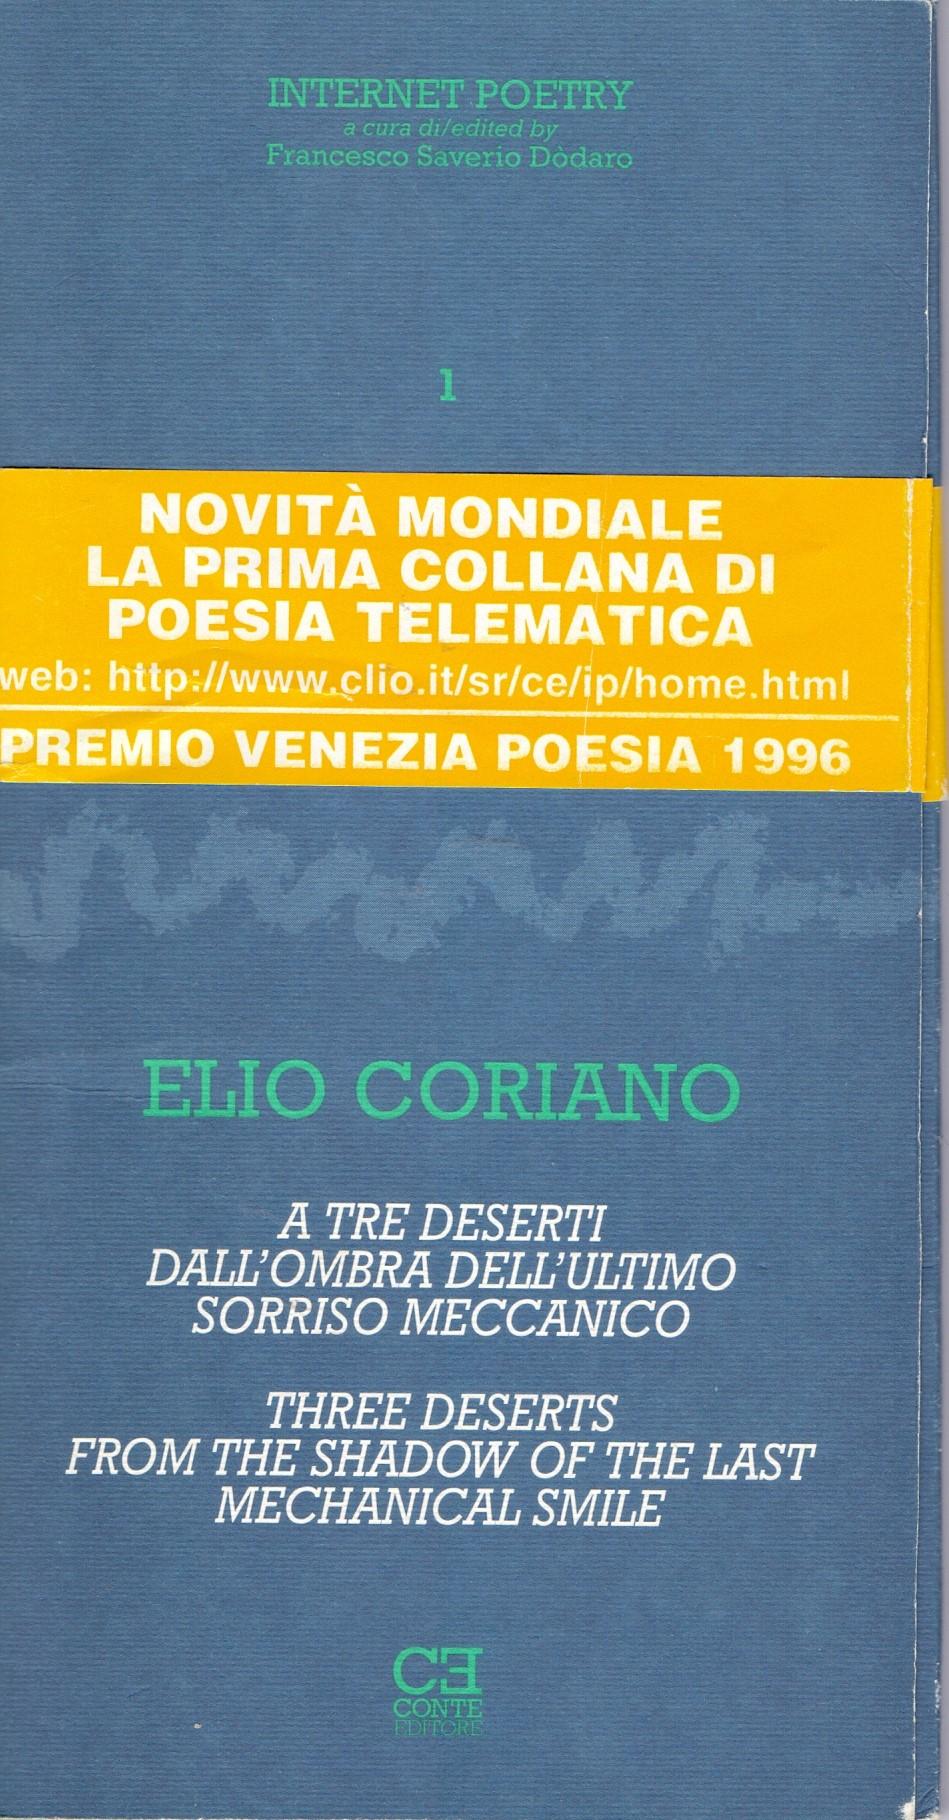 Poesia qualepoesia/25: Francesco S. Dòdaro: dal modulo all'Internet Poetry